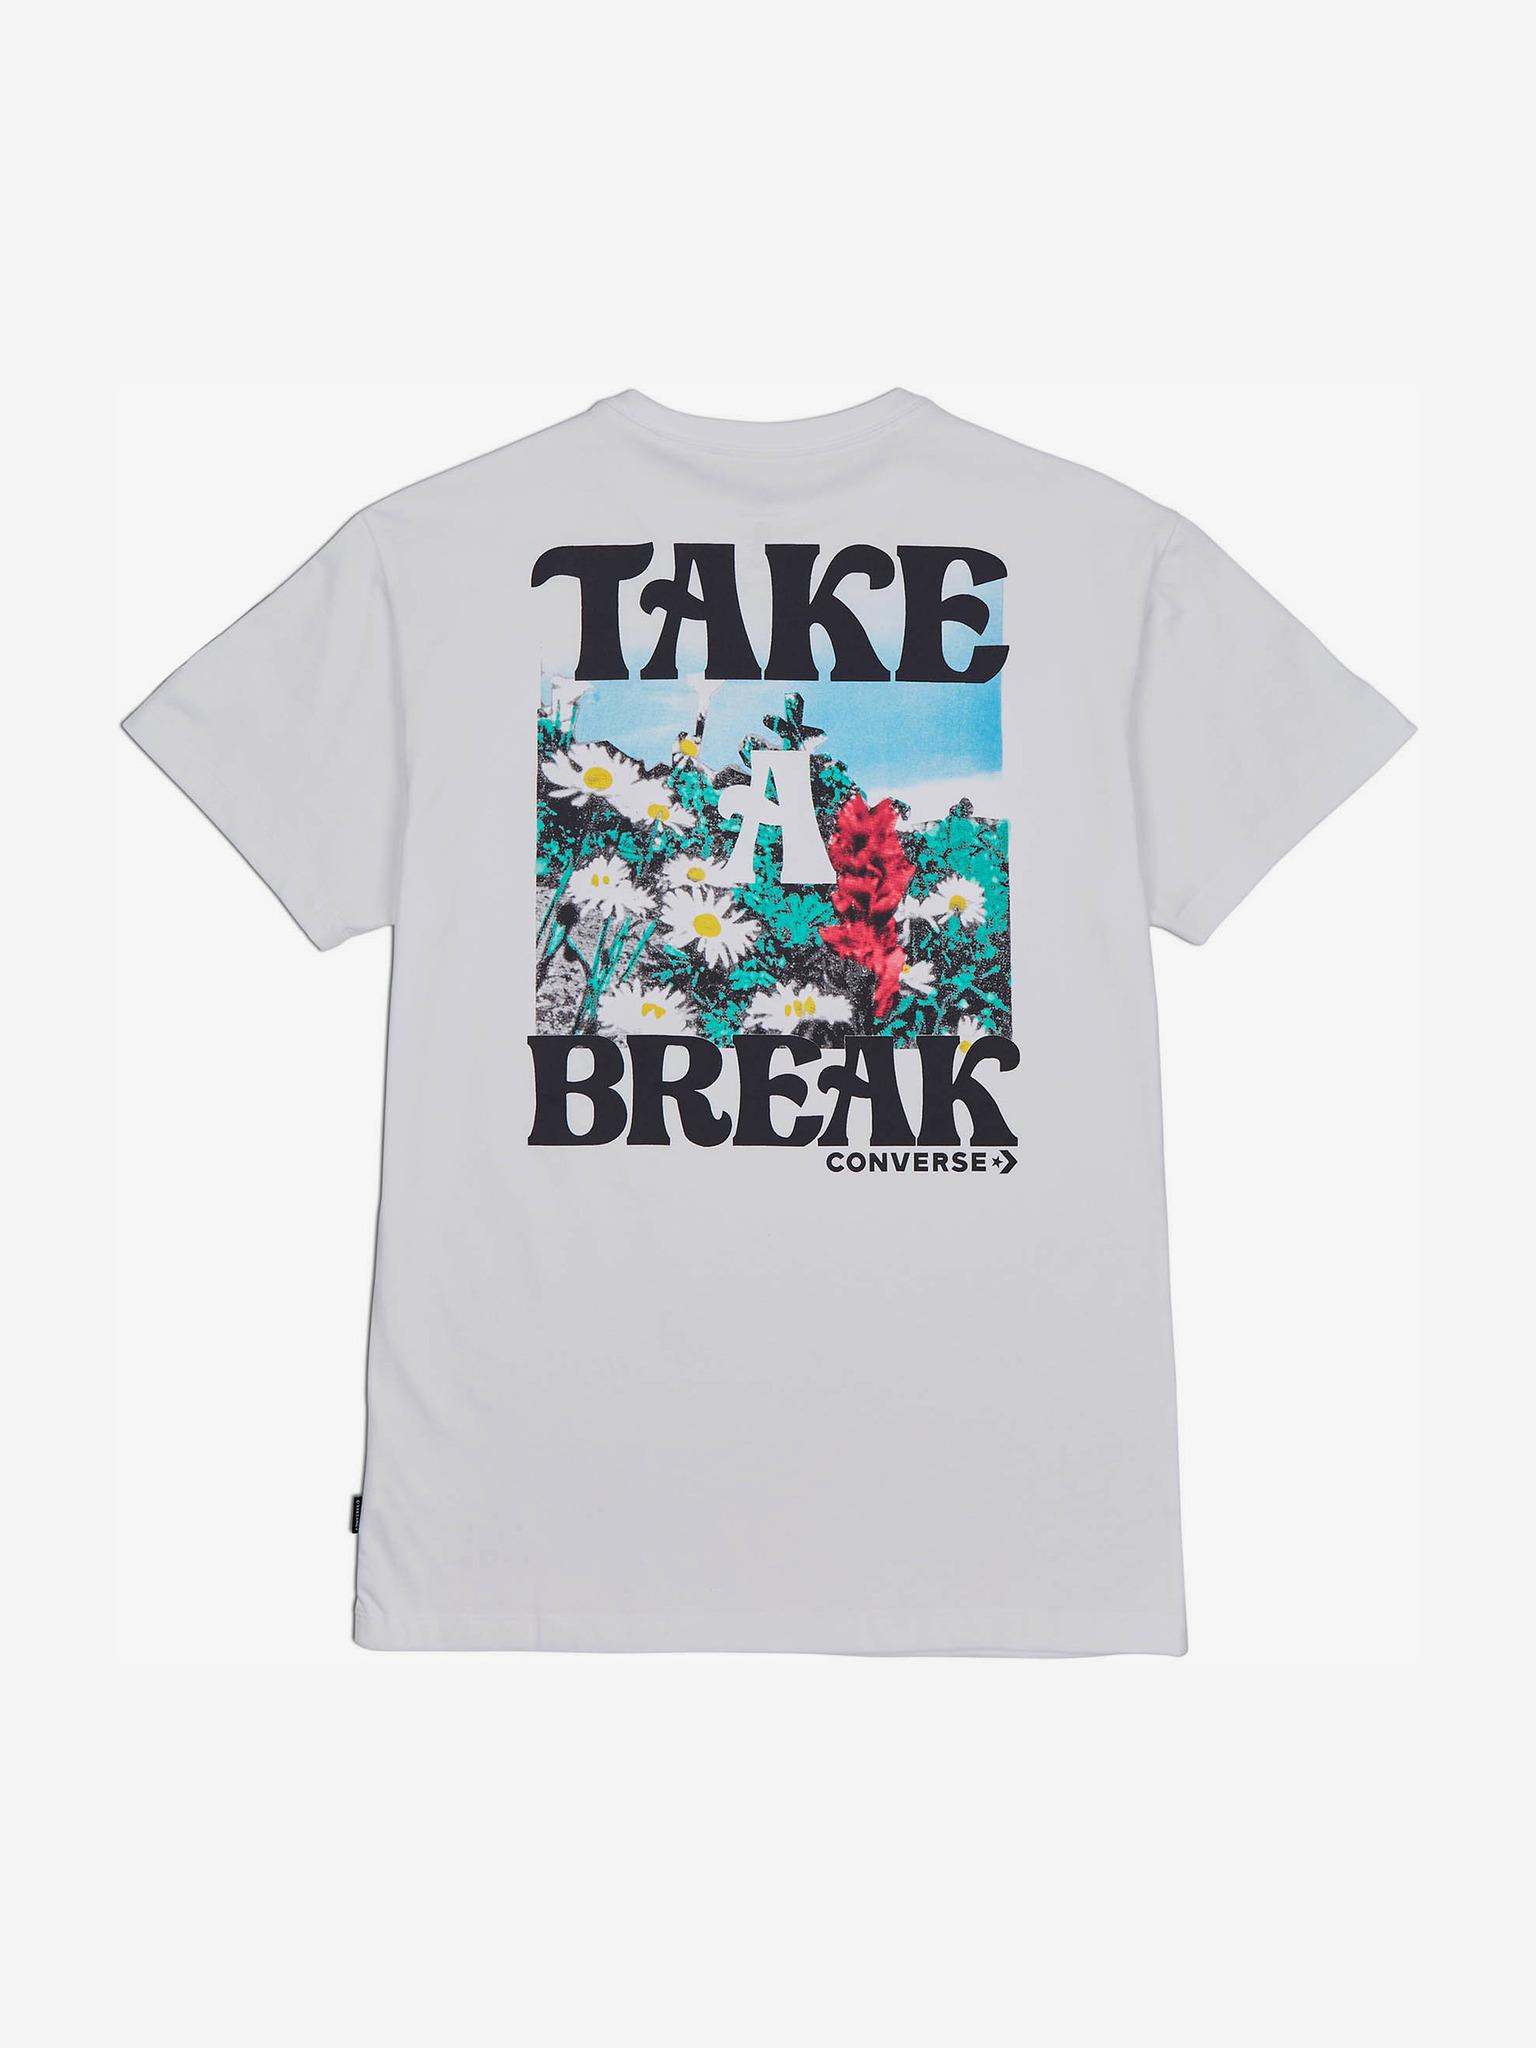 Converse Women's t-shirt white  The